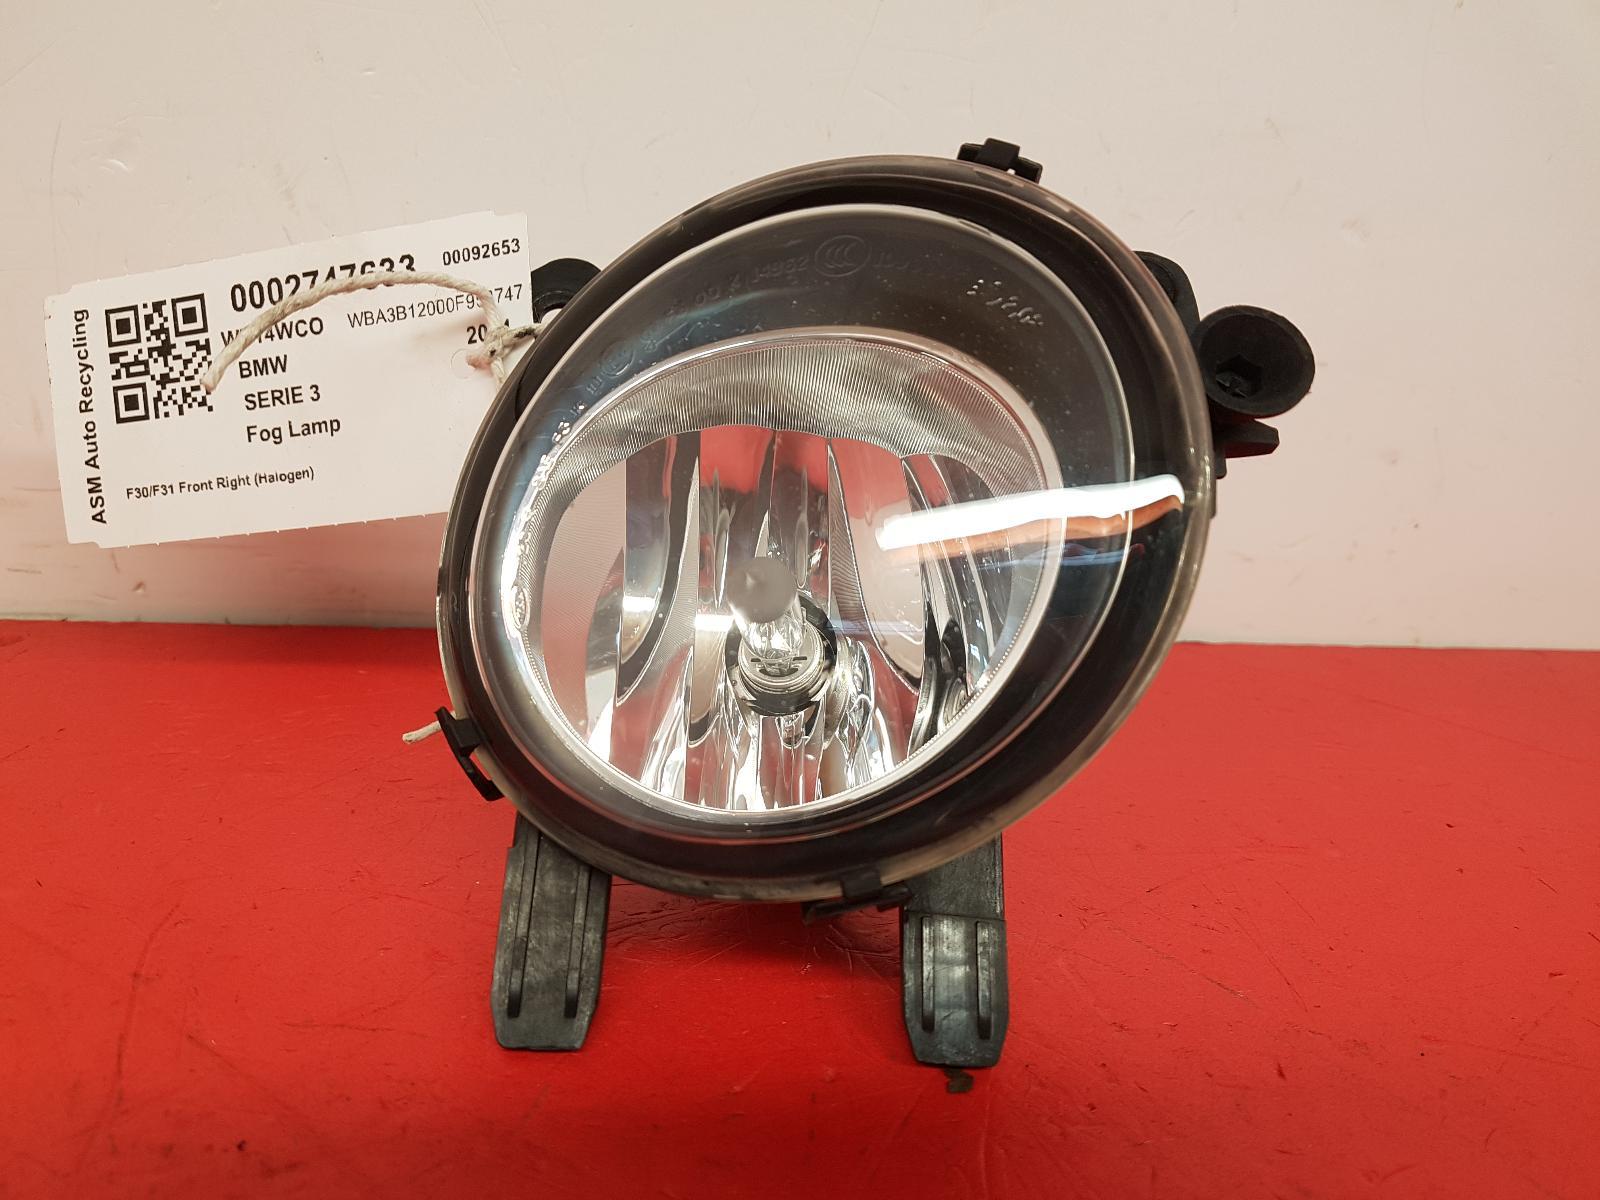 View Auto part Fog Lamp Bmw 3 Series 2014